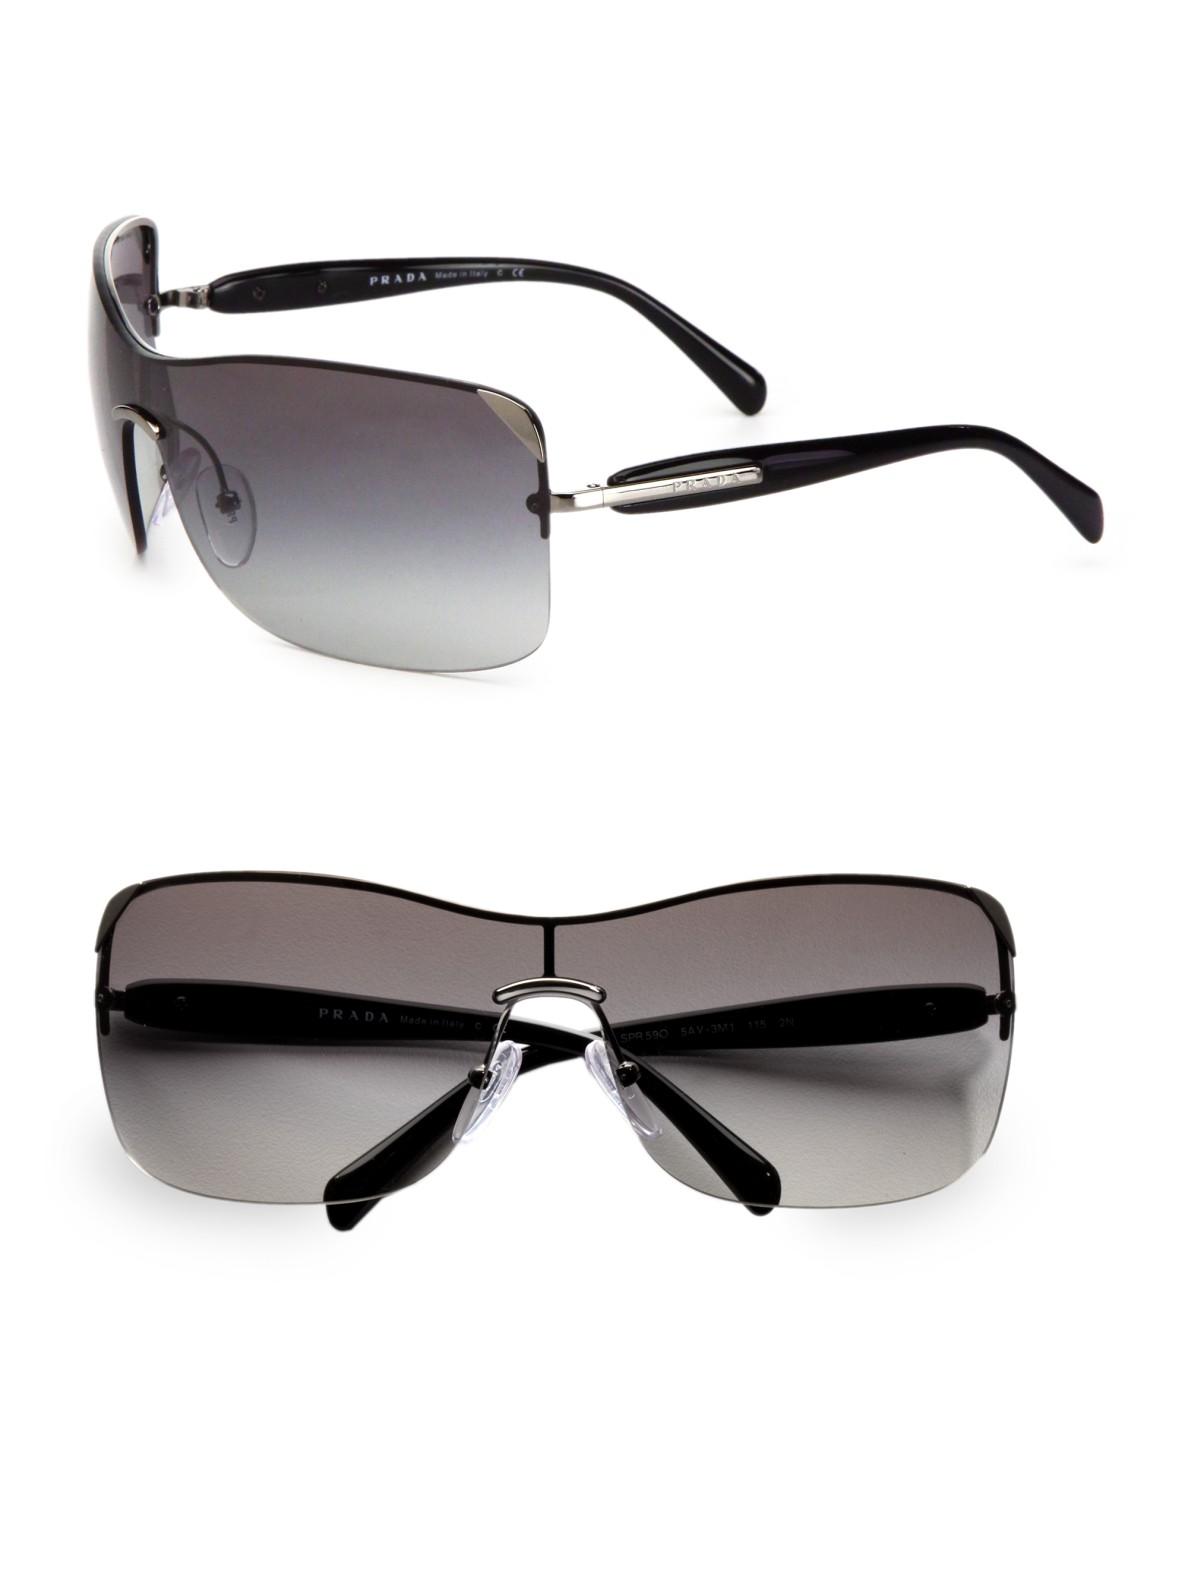 Maui Jim Warranty >> Prada Rectangular Rimless Shield Sunglasses in Grey (Gray ...